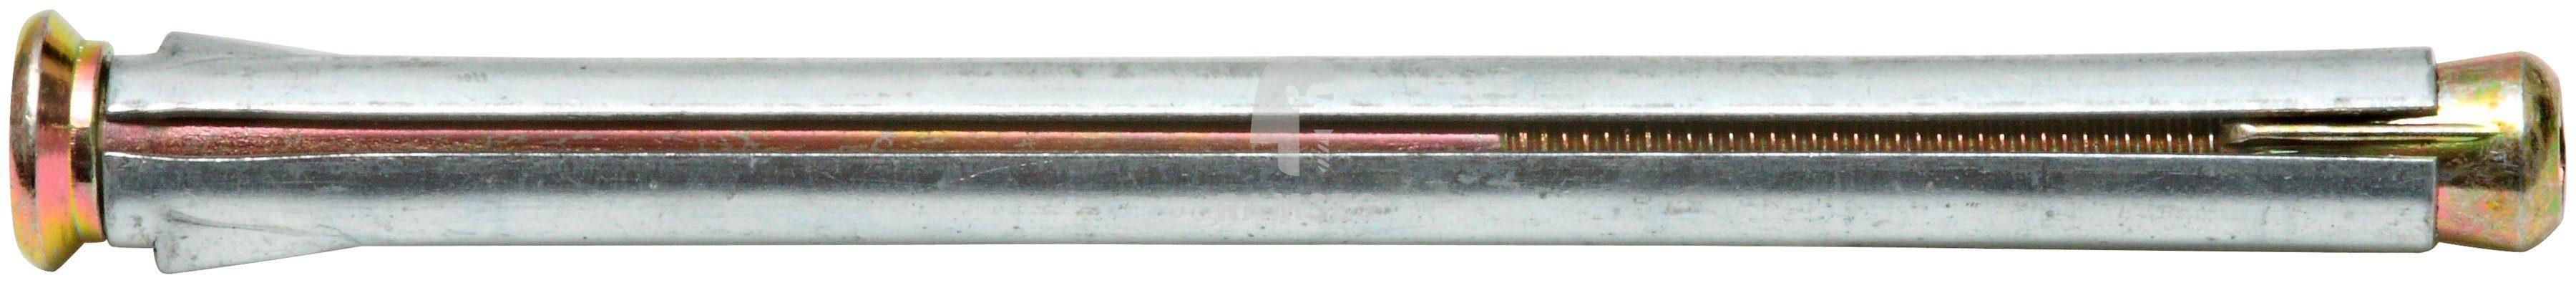 RAMSES Dübel , Metallrahmendübel 10 X 182 mm, 25 Stück